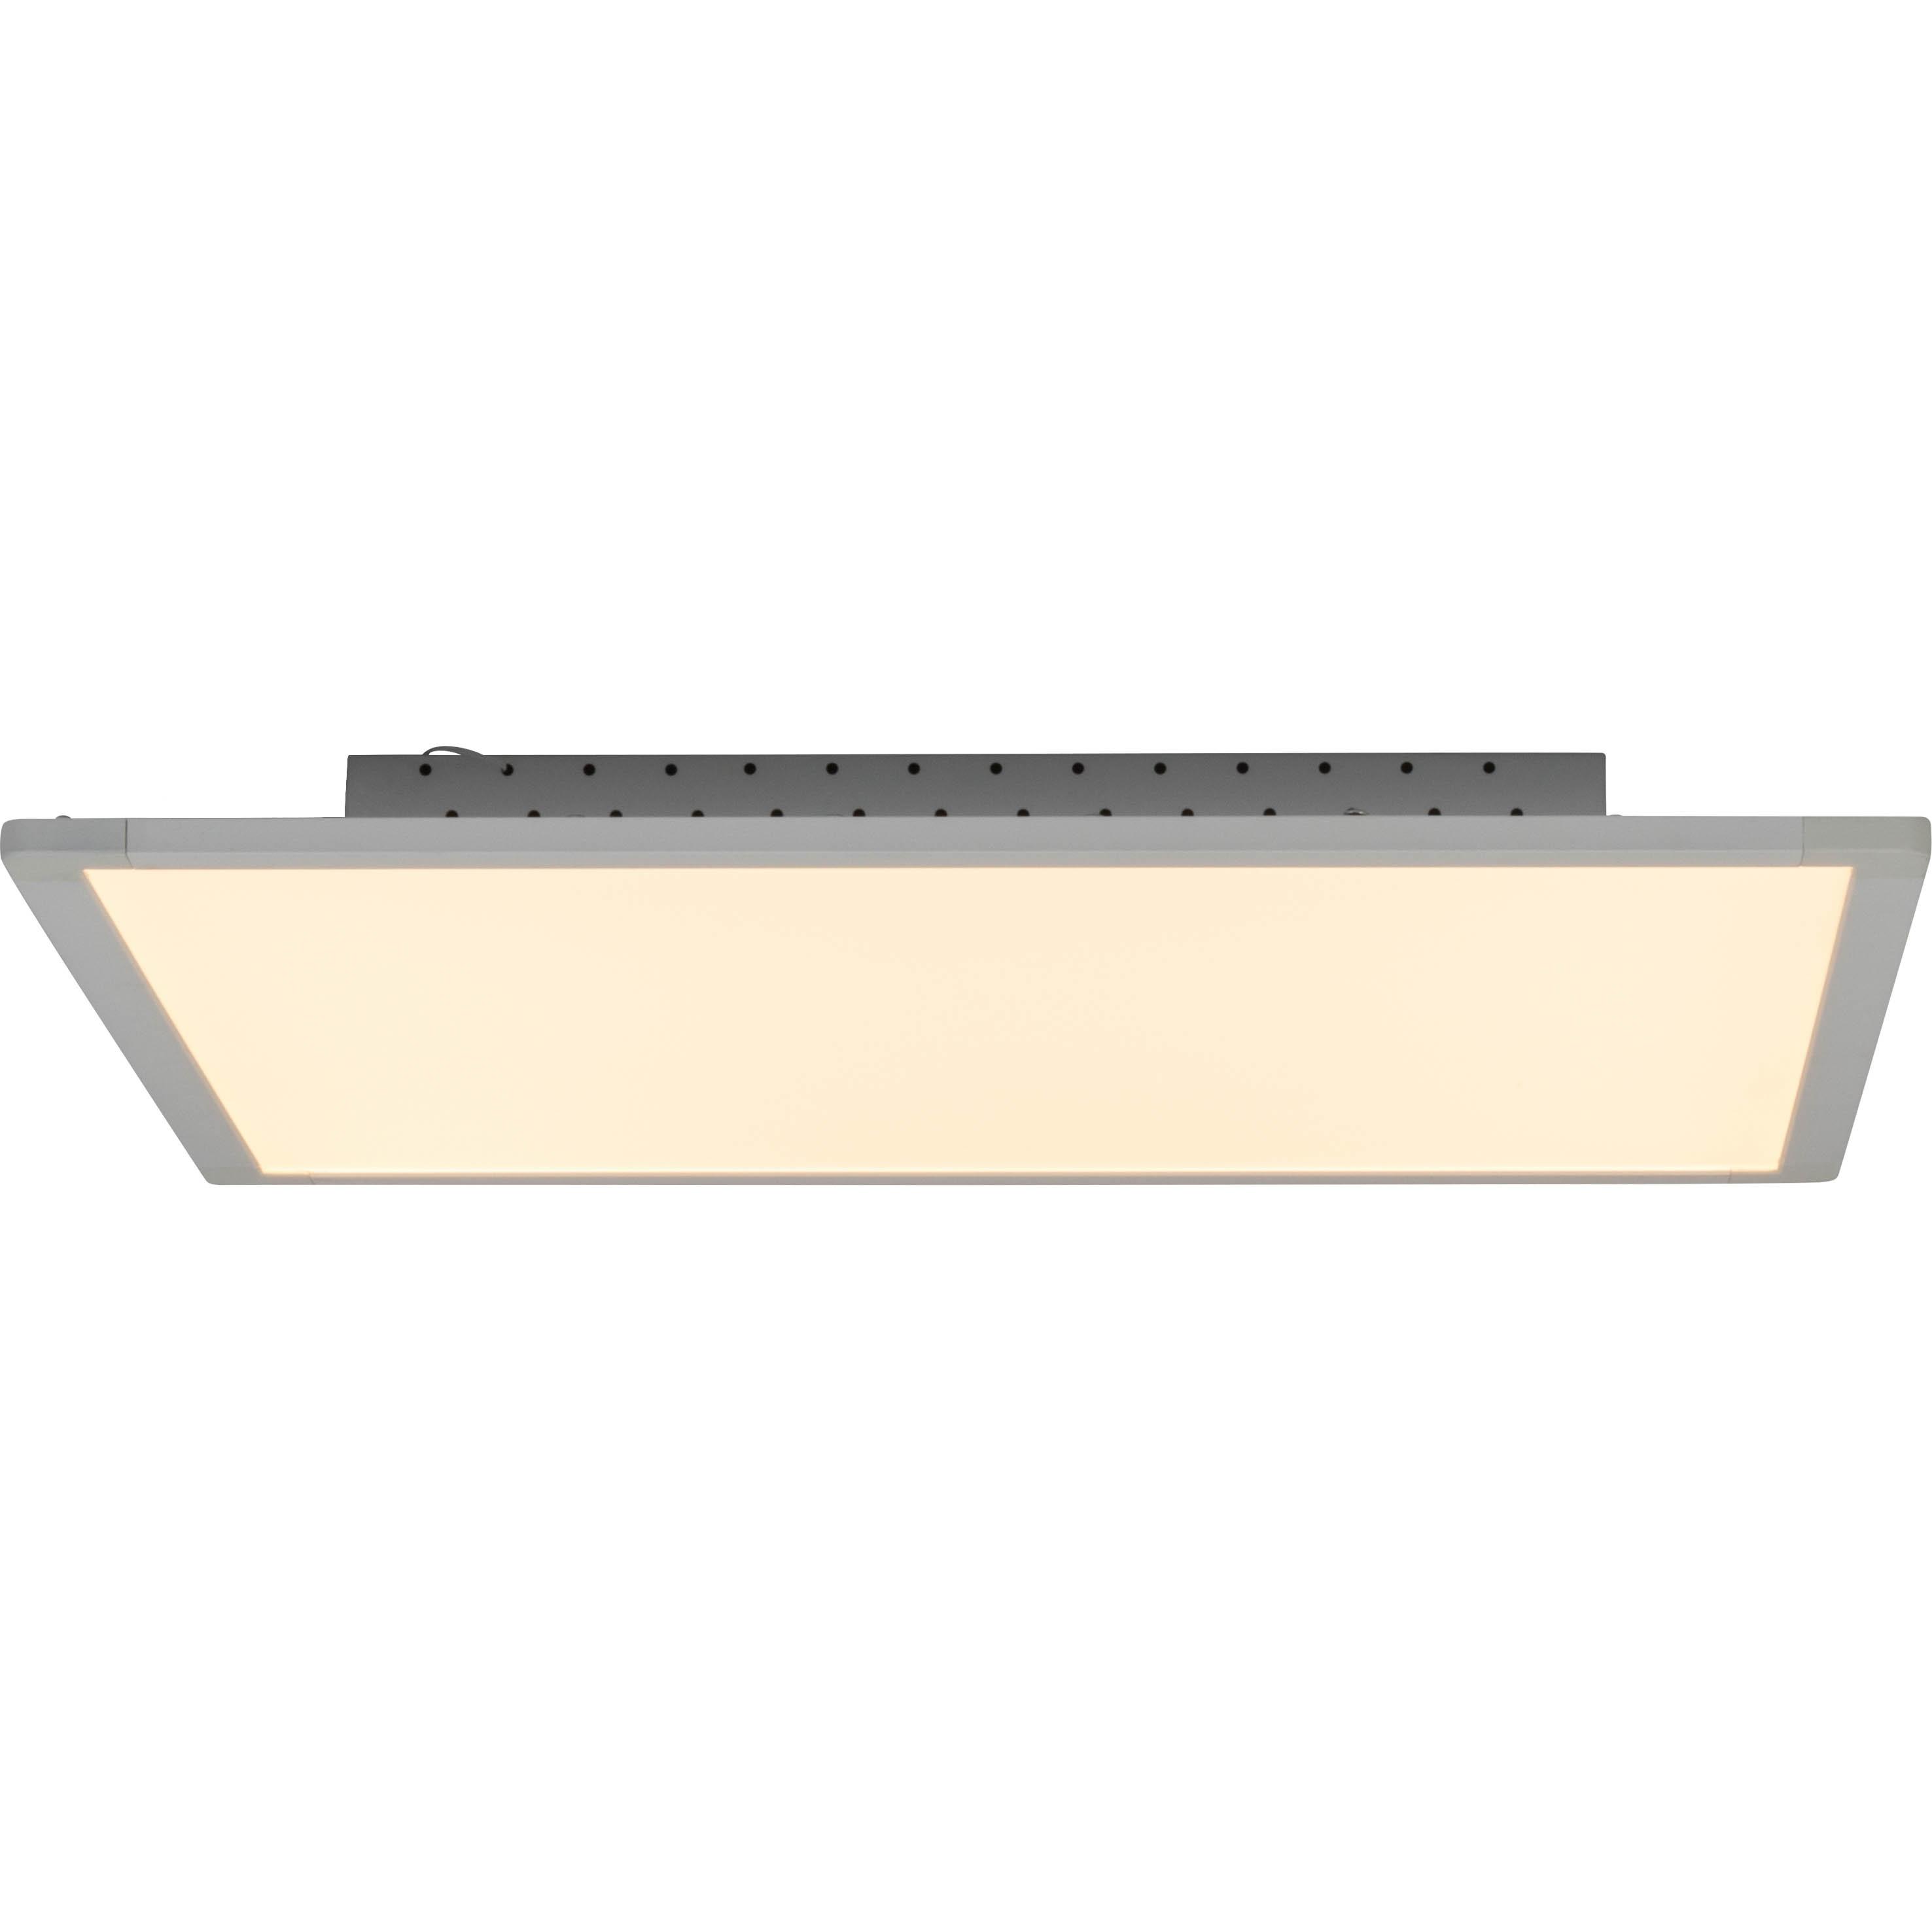 Brilliant Leuchten Flavia LED Deckenaufbau-Paneel 60x60cm weiß